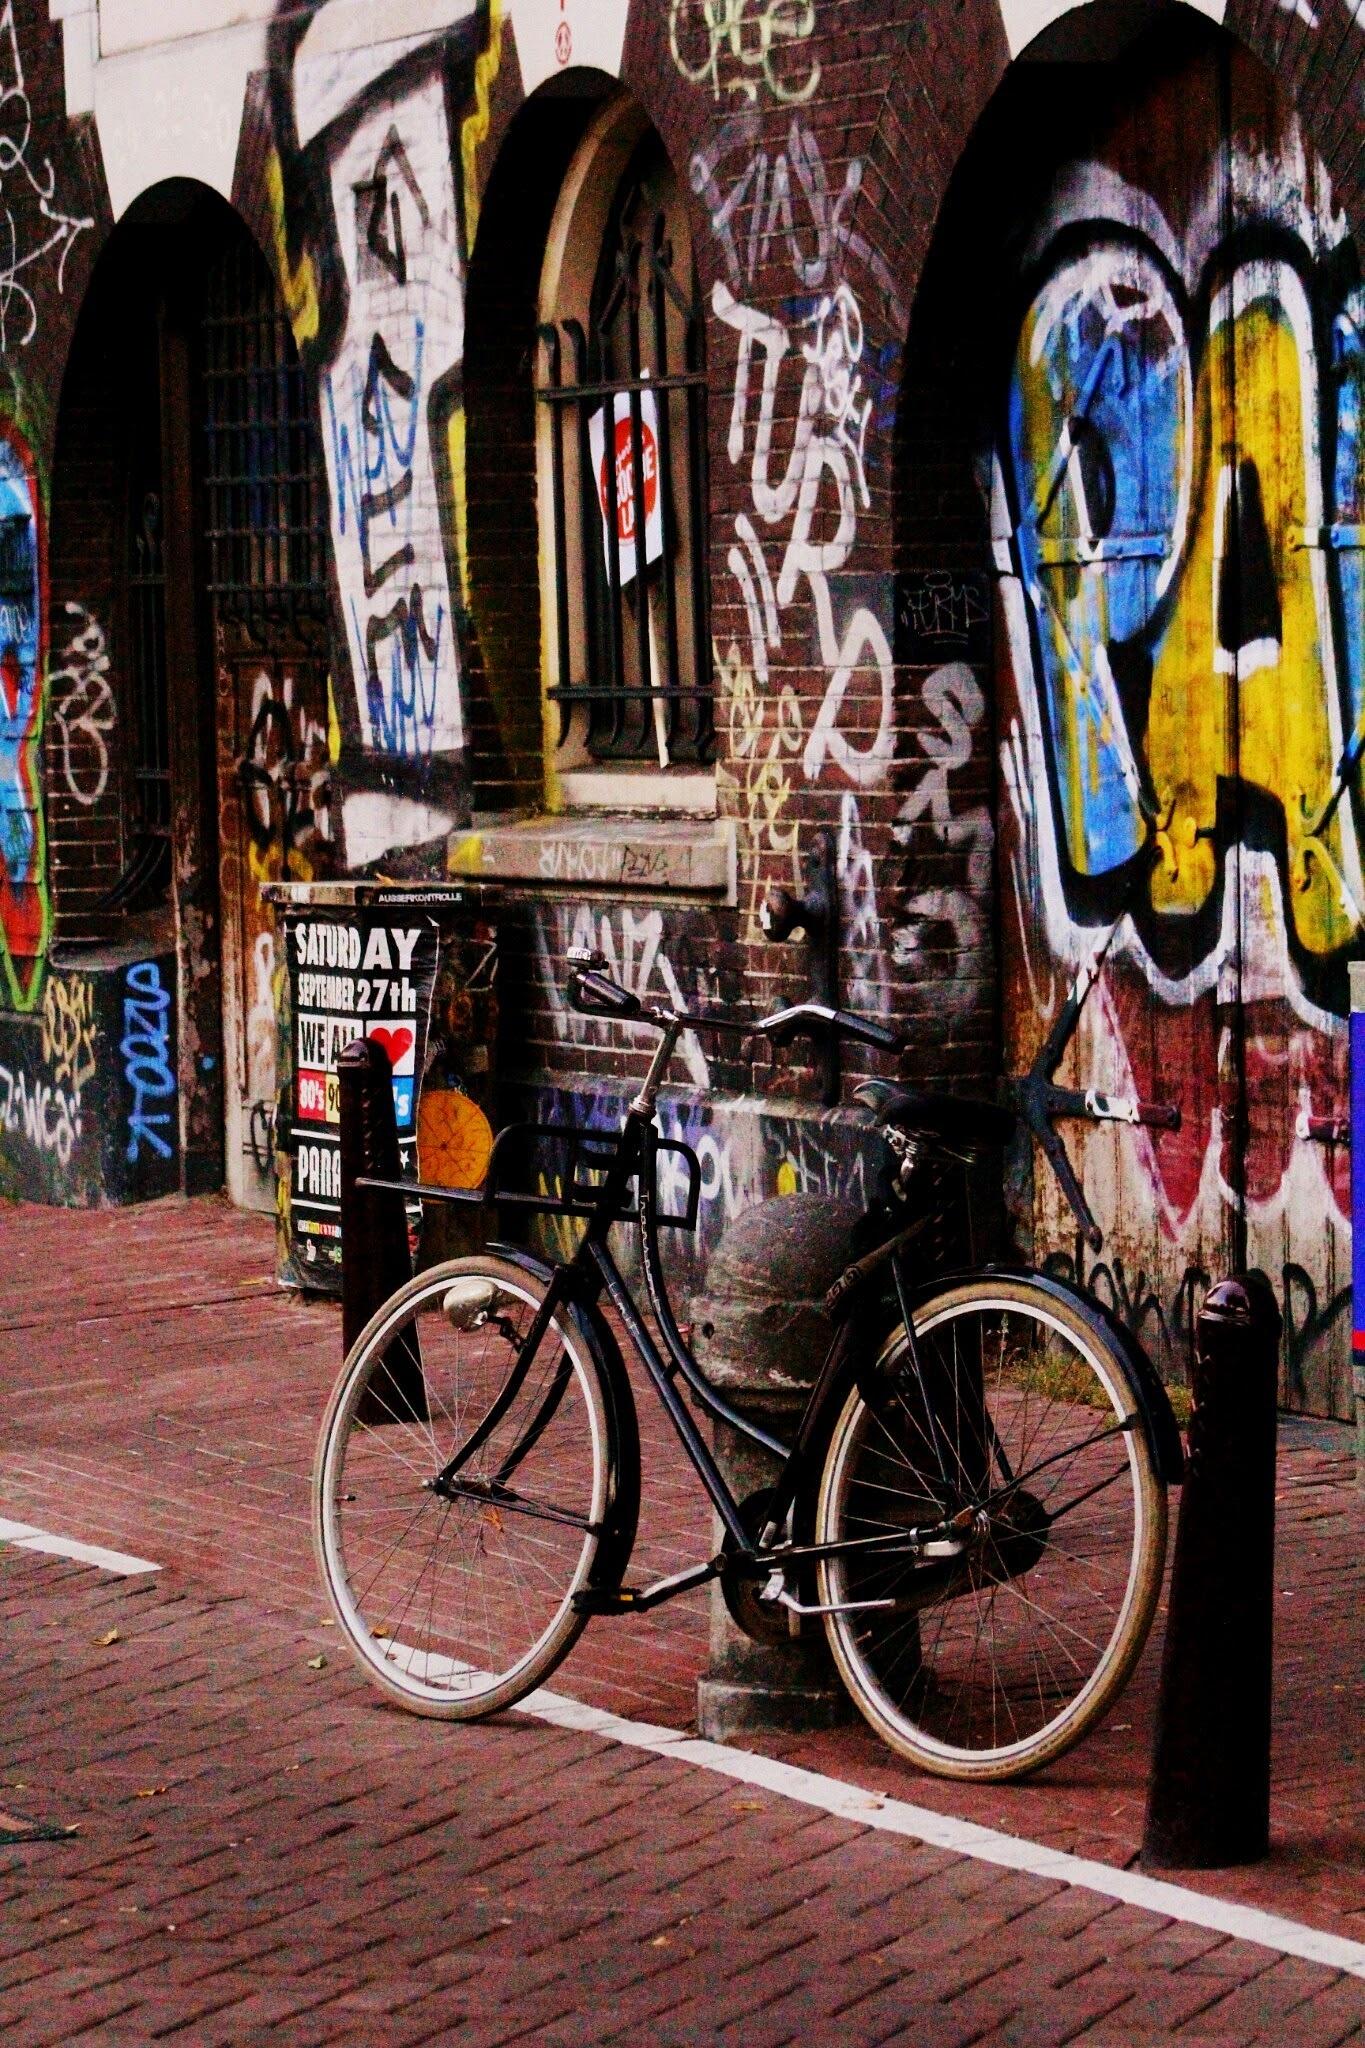 Amsterdam street art scene by MF - SyracuseLUX